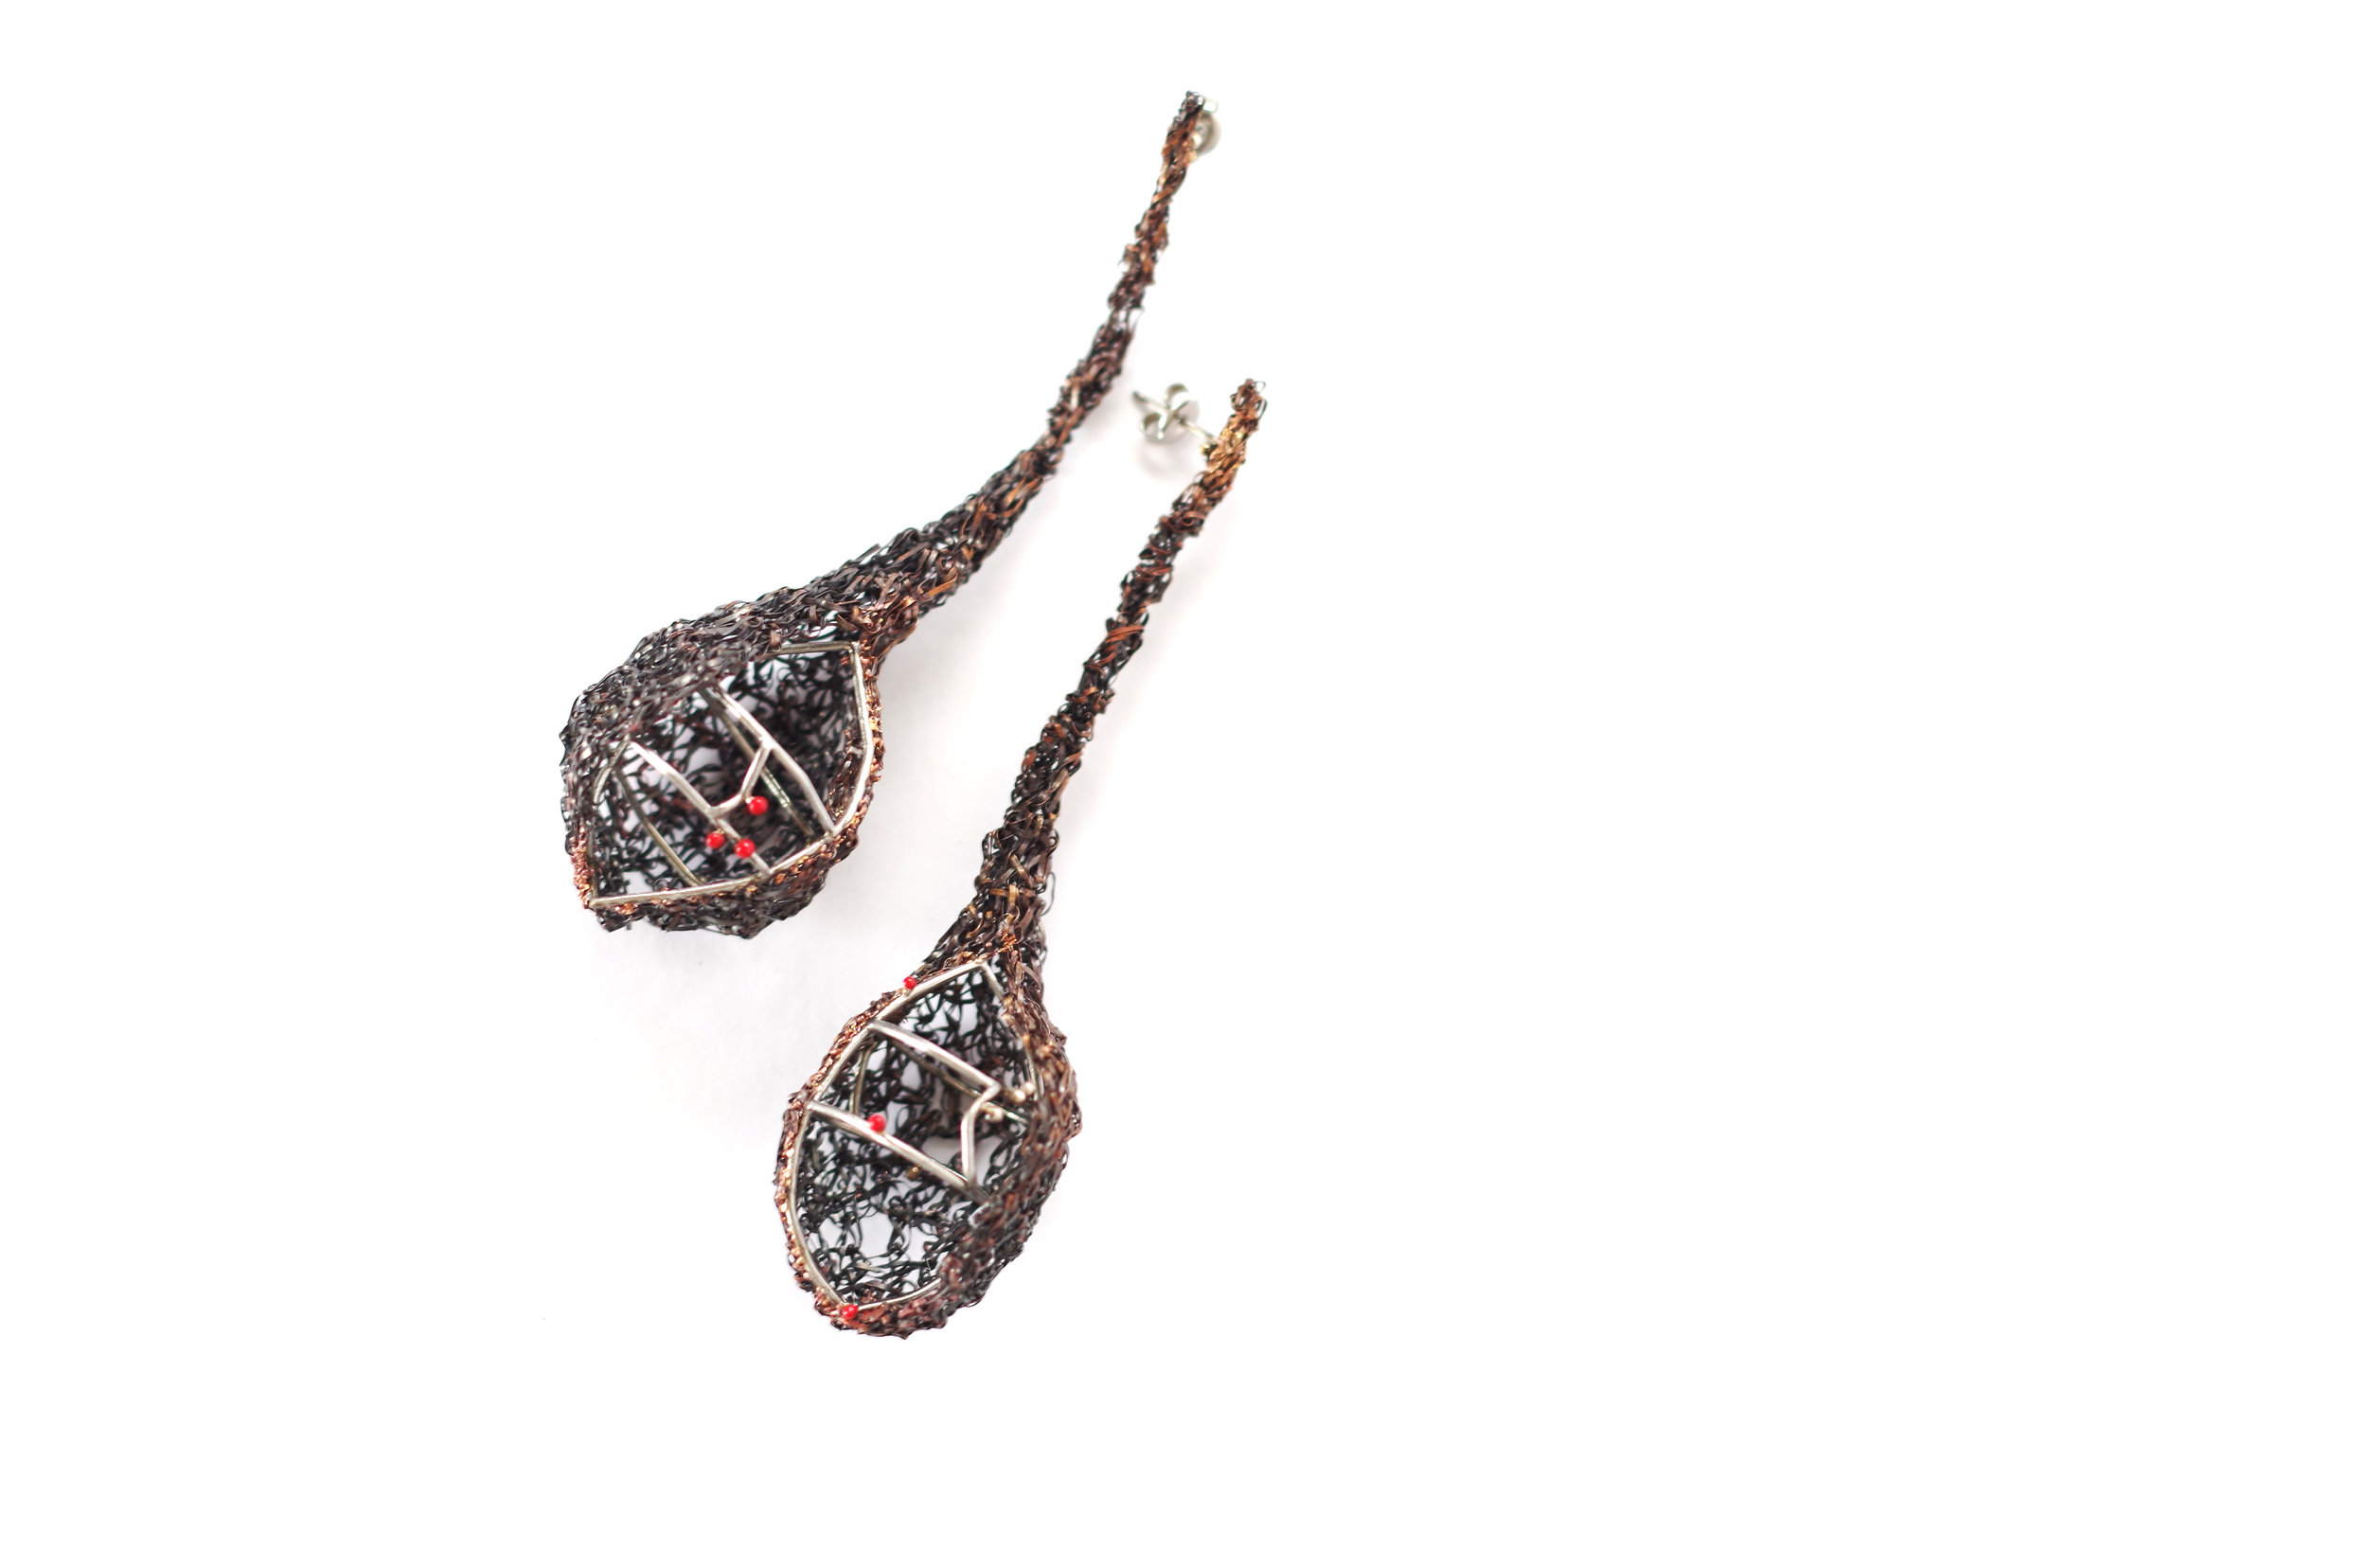 aelita ba graduate collection crochet contemporary jewelleryIMGP3941.JPG